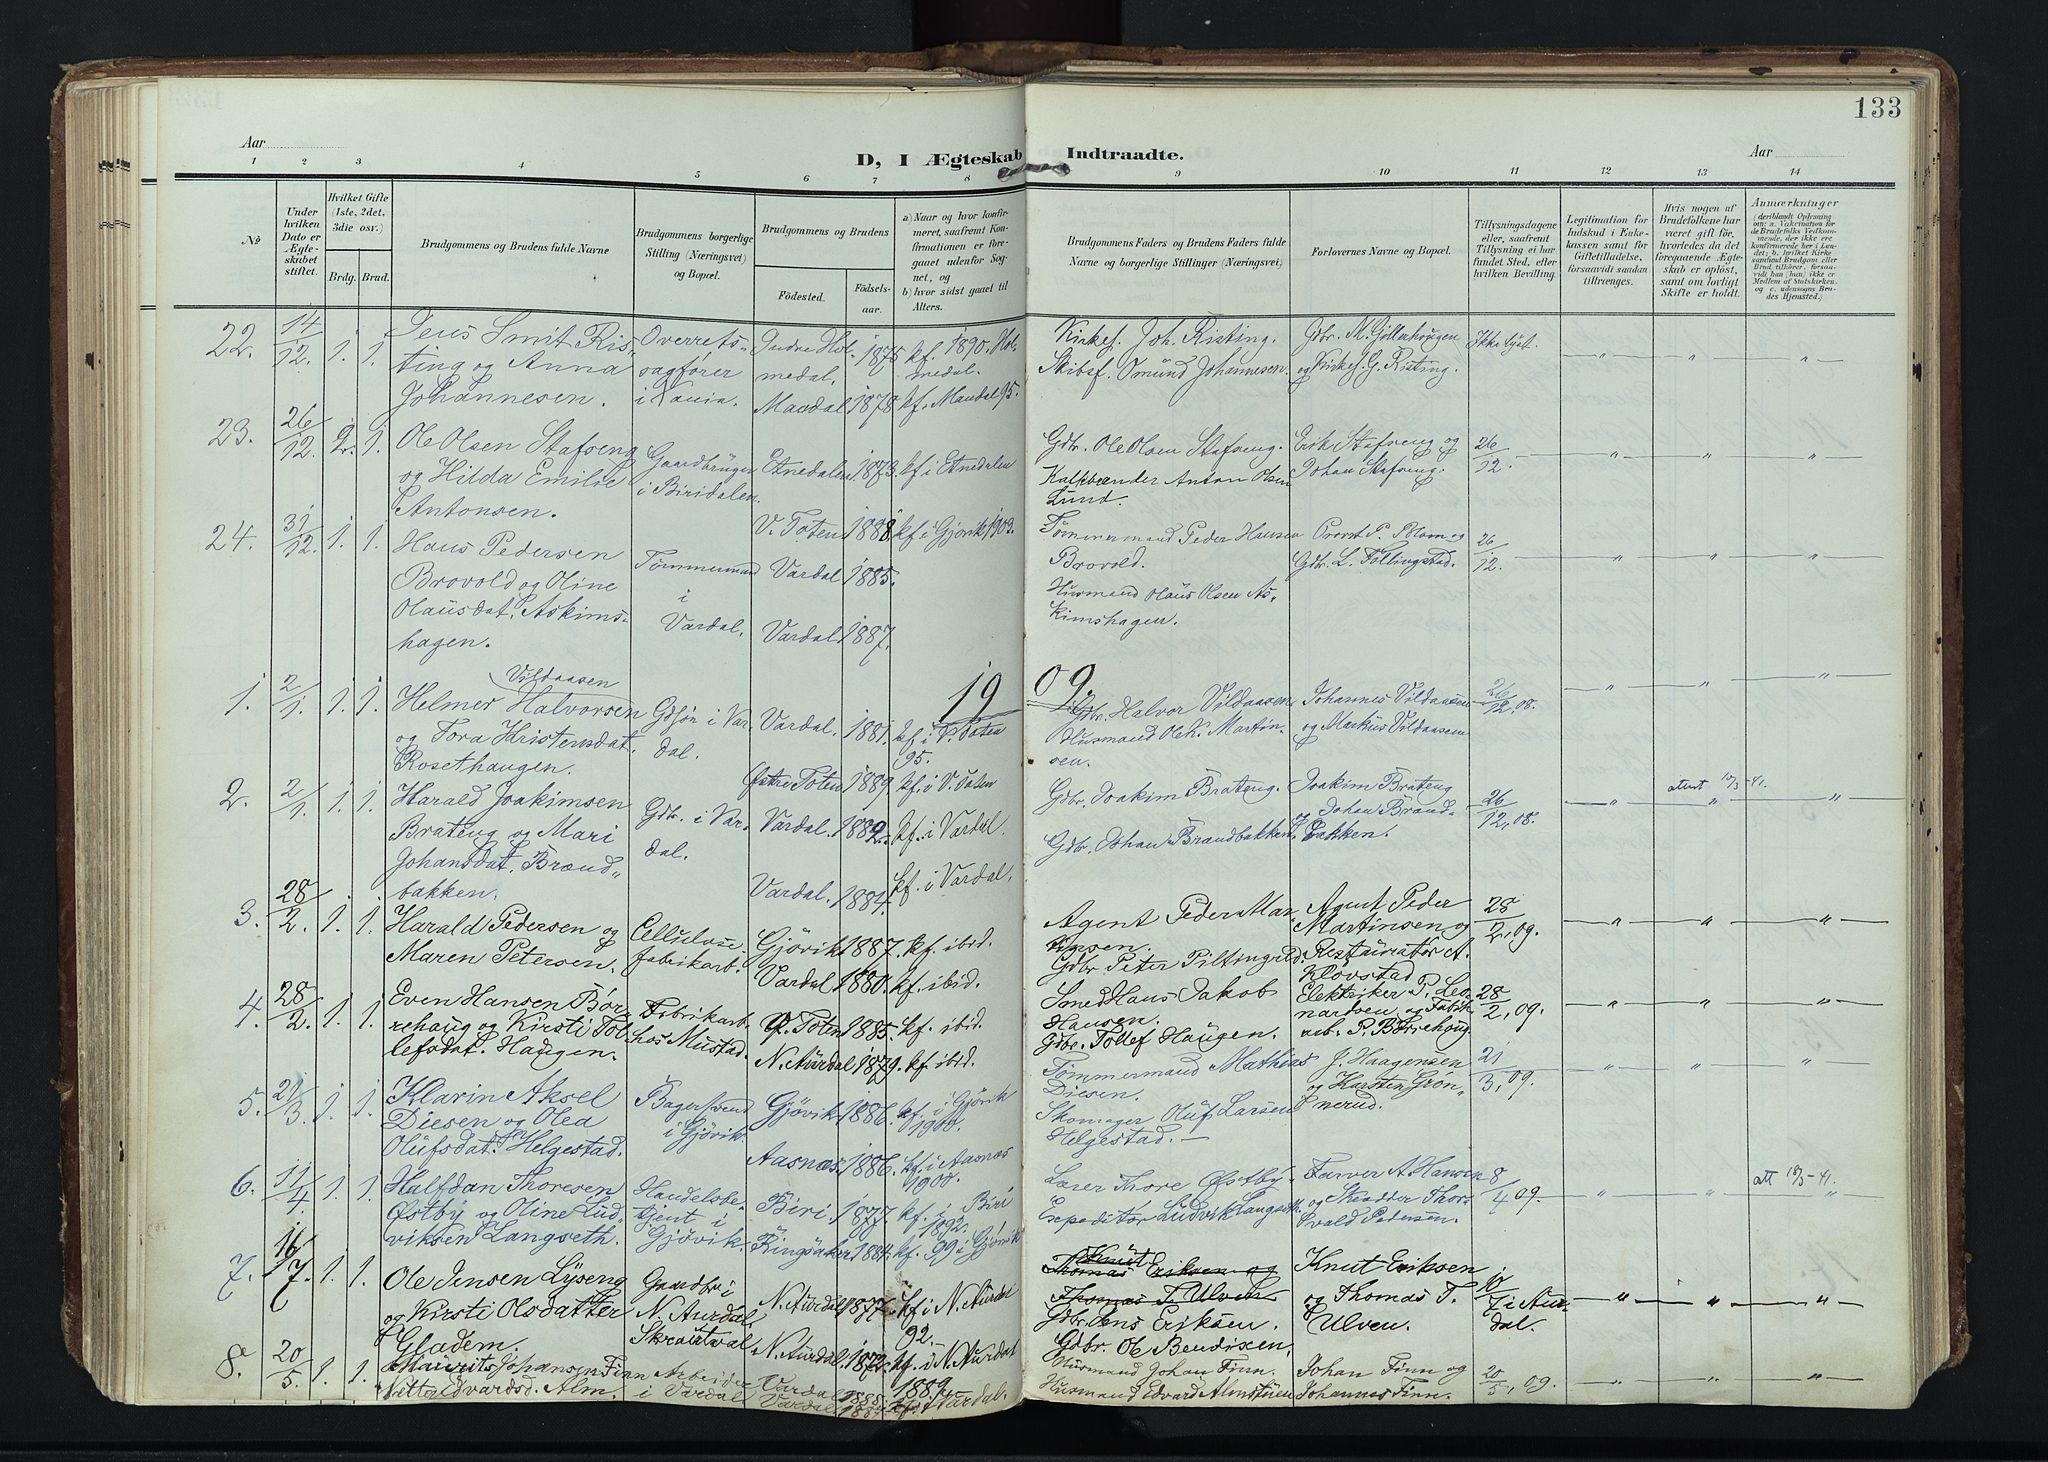 SAH, Vardal prestekontor, H/Ha/Haa/L0020: Ministerialbok nr. 20, 1907-1921, s. 133